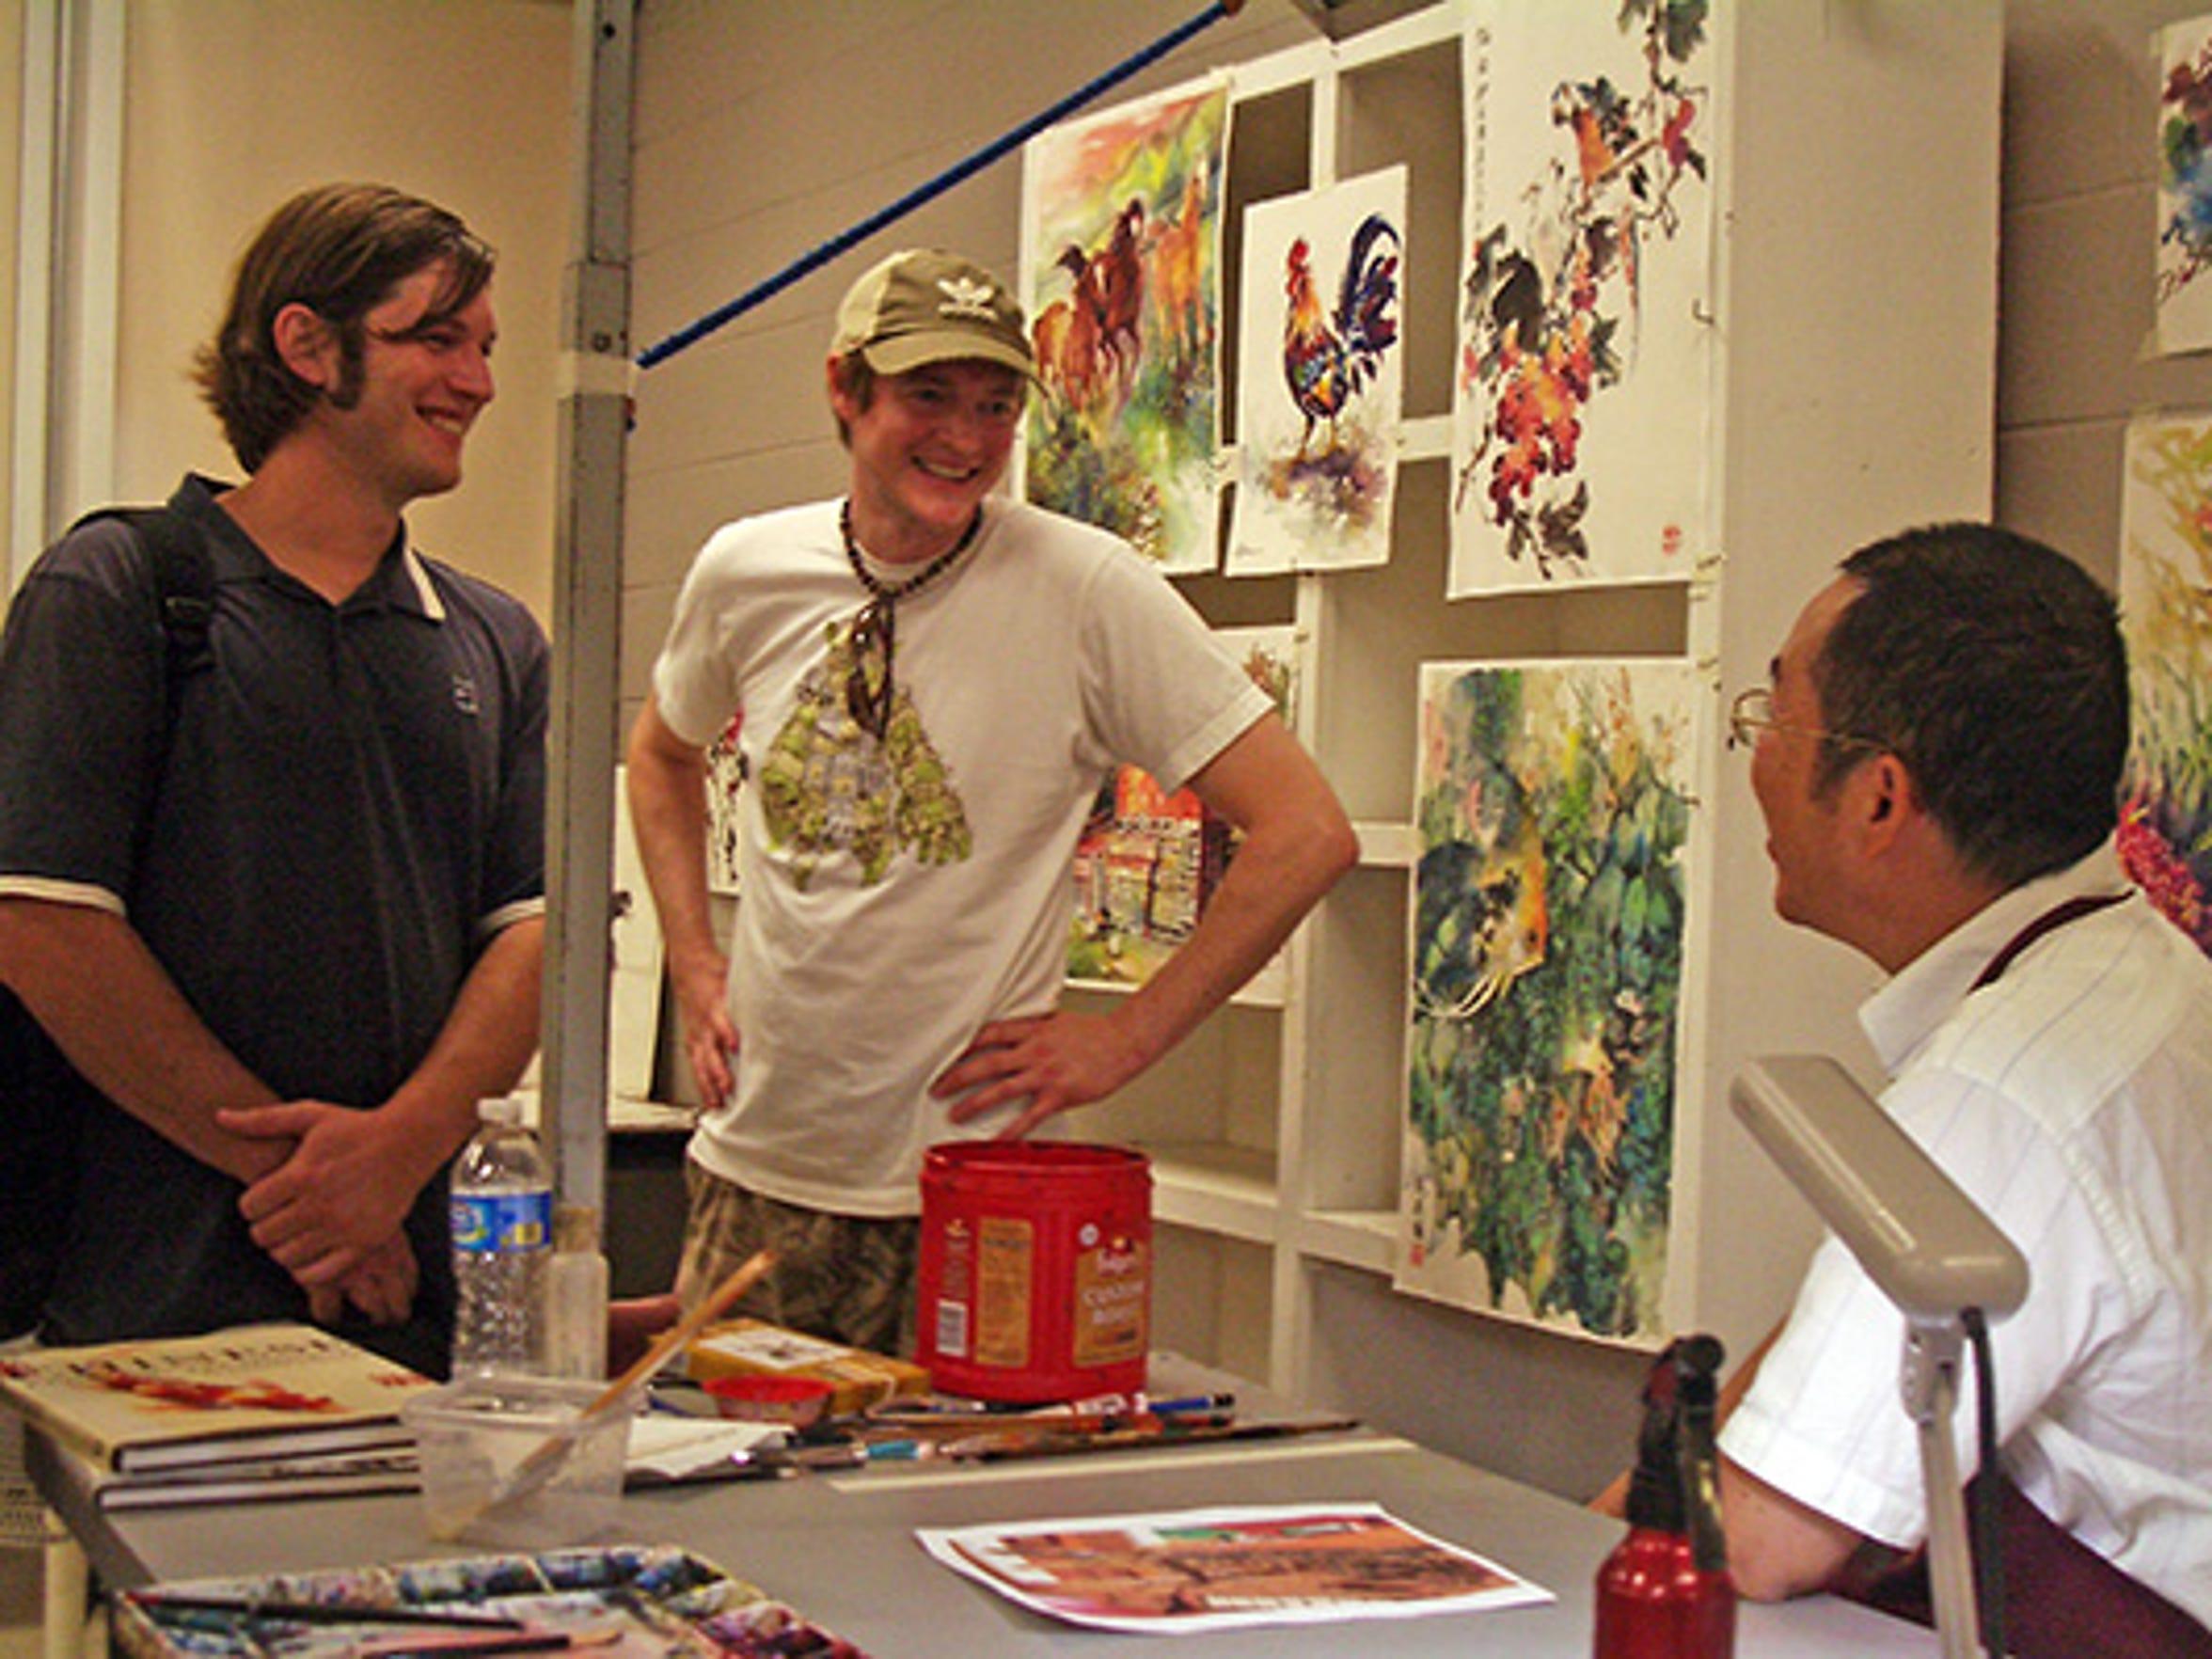 Lian Zahn,  (far right) of California, here to give